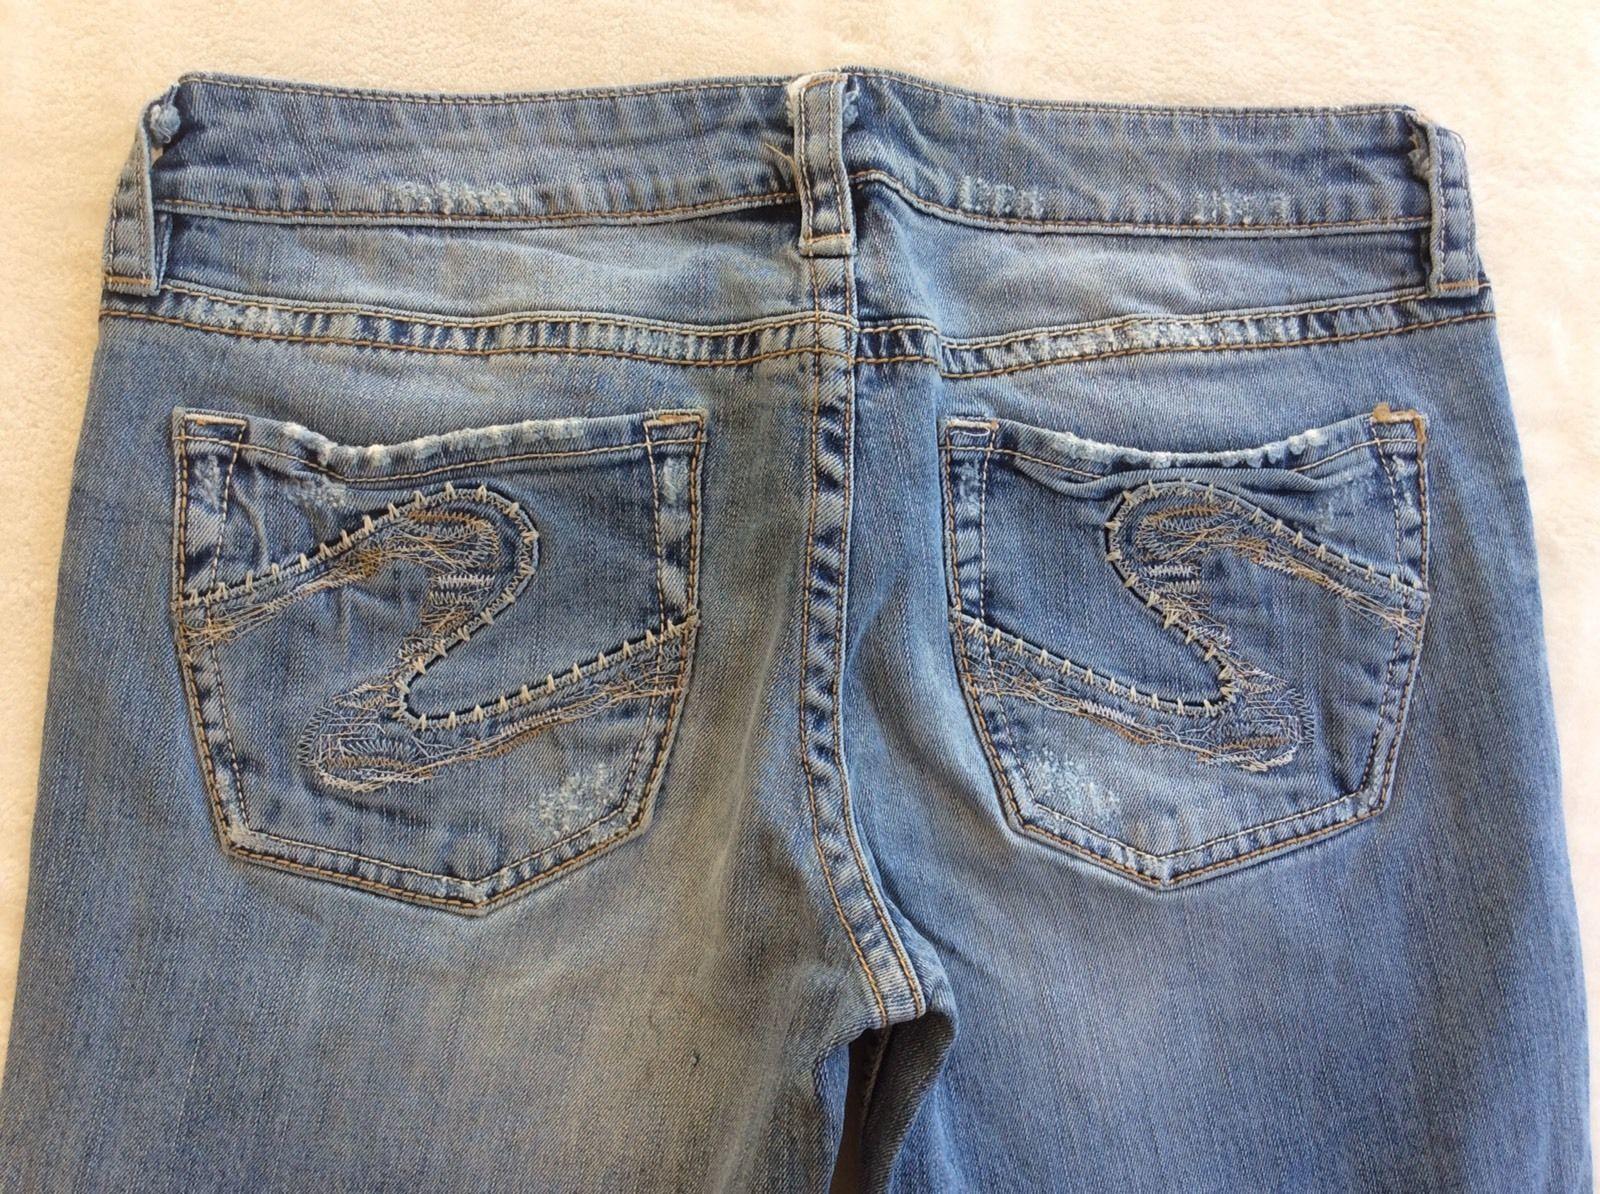 SILVER JEANS Sale New Buckle Low Rise Lola Stretch Jean Denim Cuffed Shorts 29